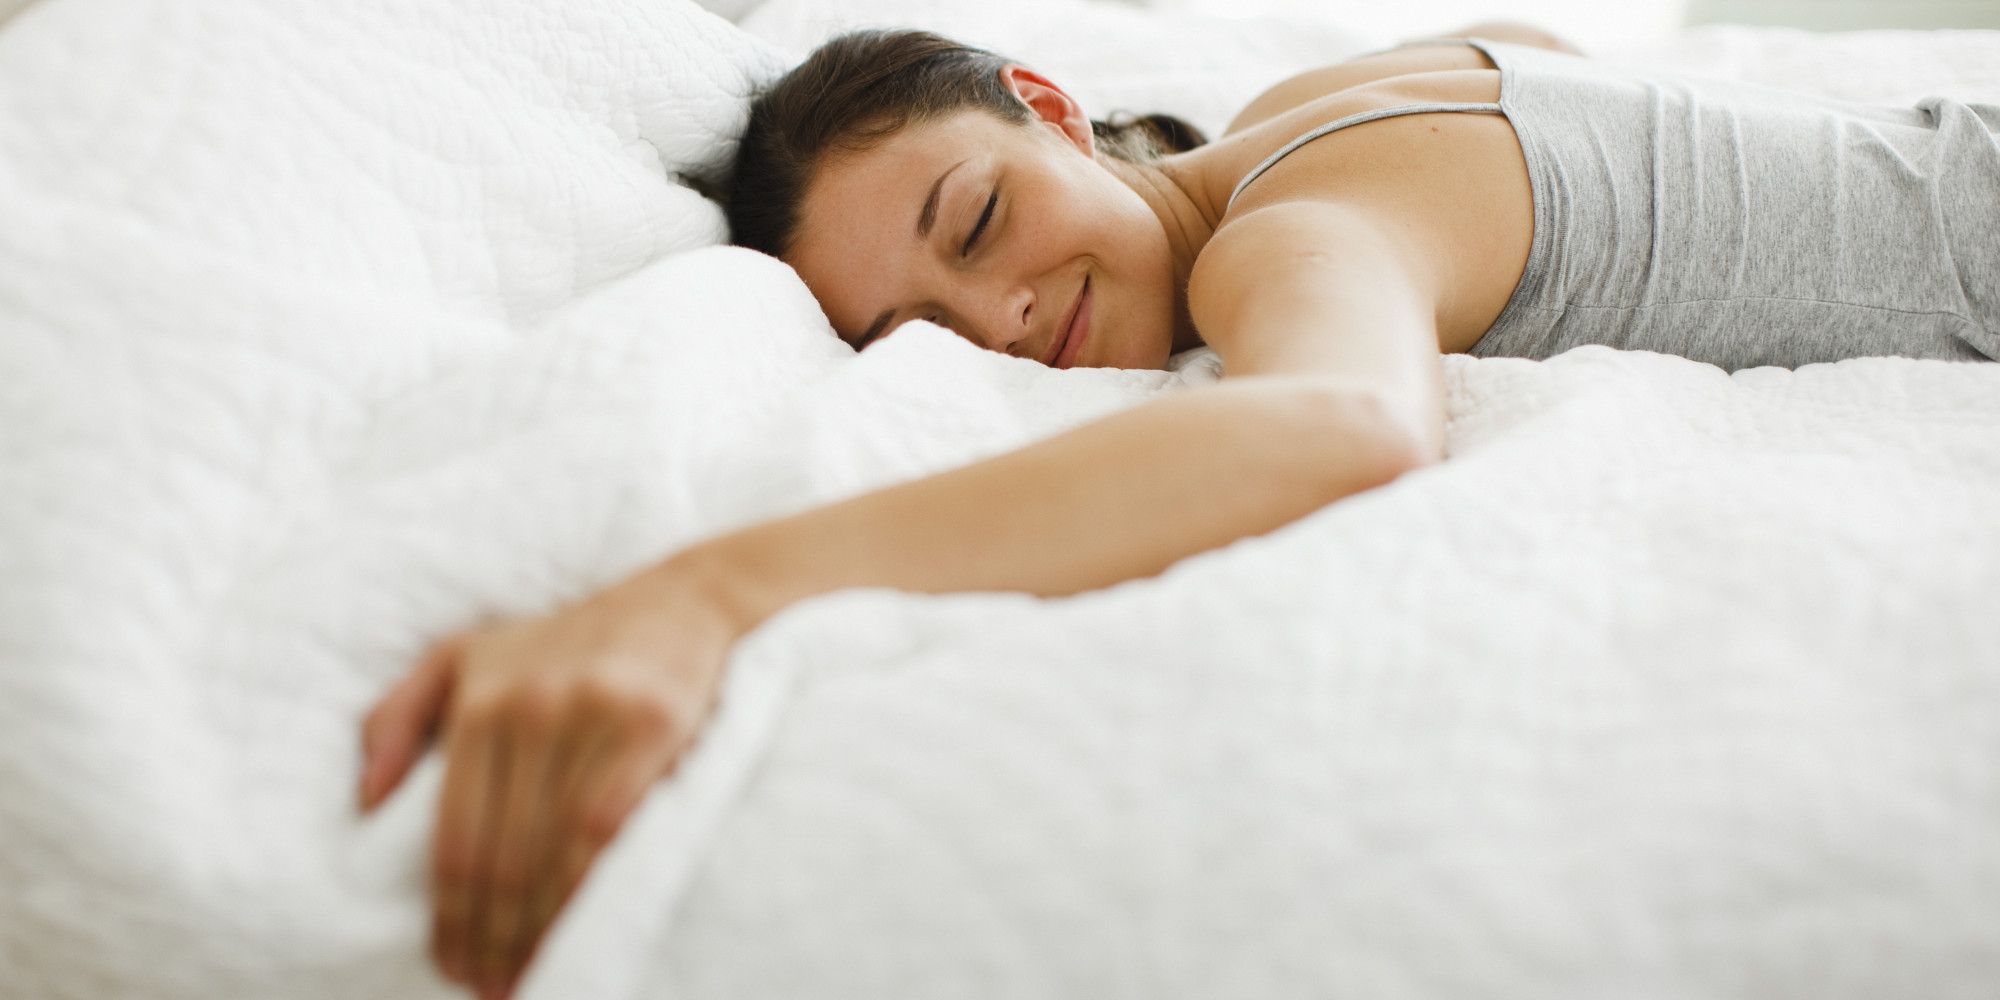 Men And Women In Bedroom 5 Bedroom Daccor Tips For A Better Nights Sleep Huffpost